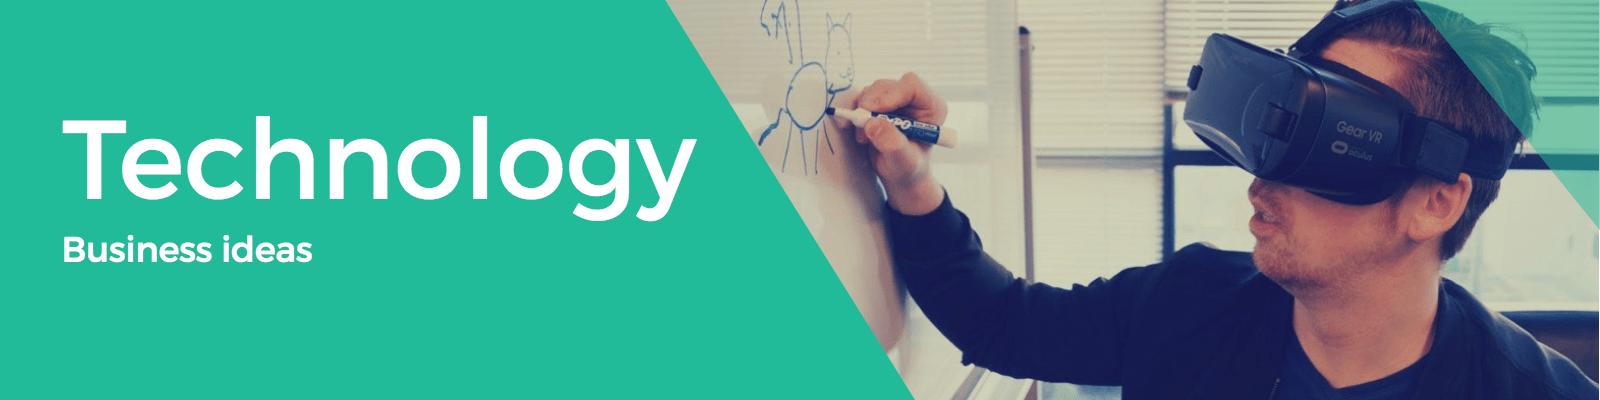 technology small business ideas